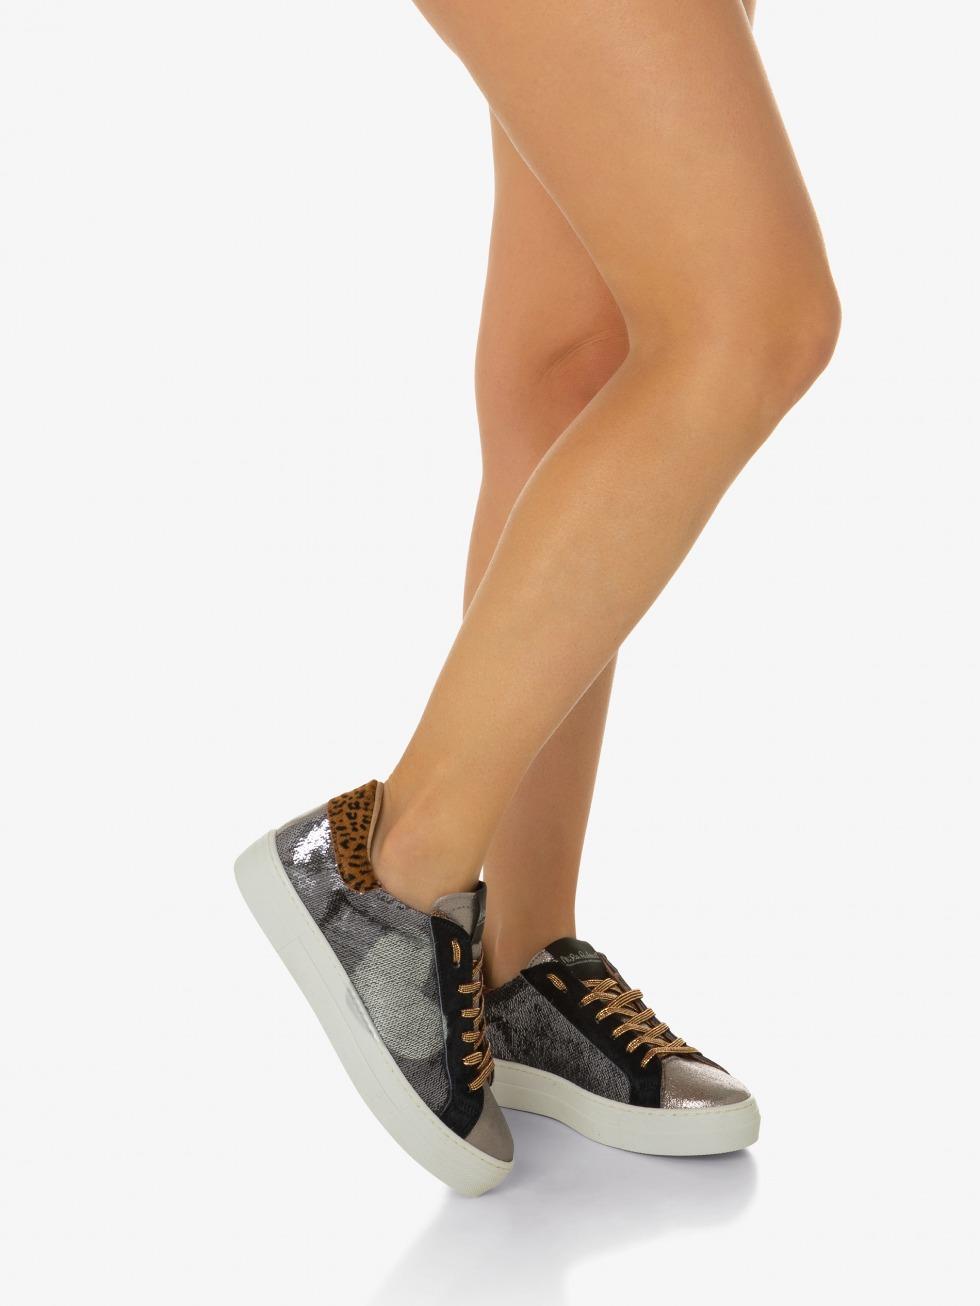 Silver Sparkle Martini Sneakers - Heart